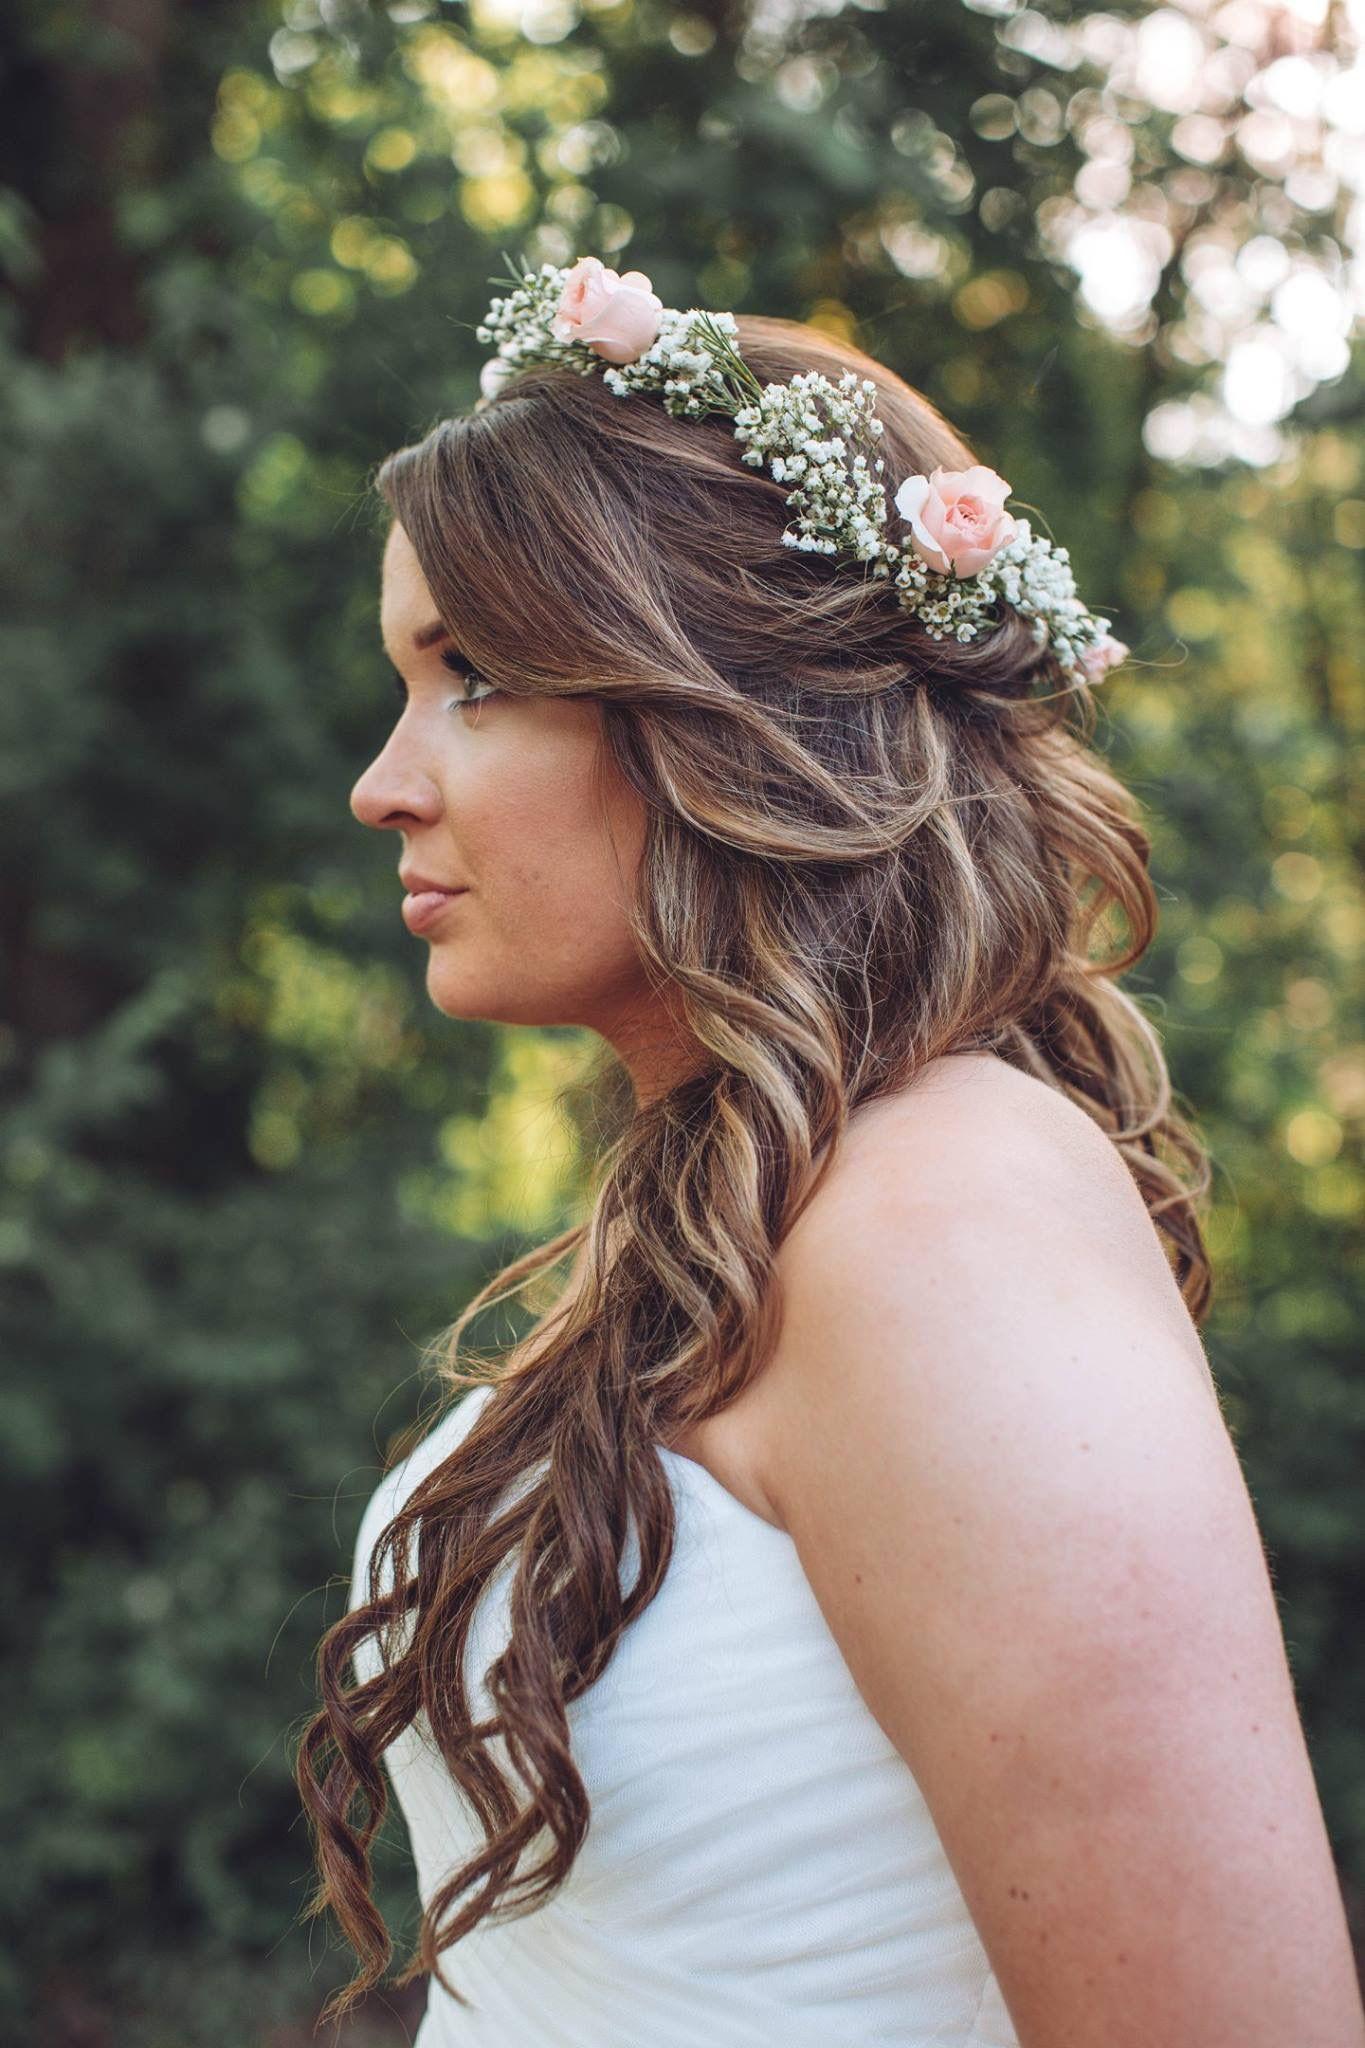 Fresh Bridal Crown Halo Of Fresh Babies Breath And Soft Majolika Pink Spray Roses Flowers By Tammy 42 Ivory Wedding Flowers Bridal Crown Flower Crown Wedding